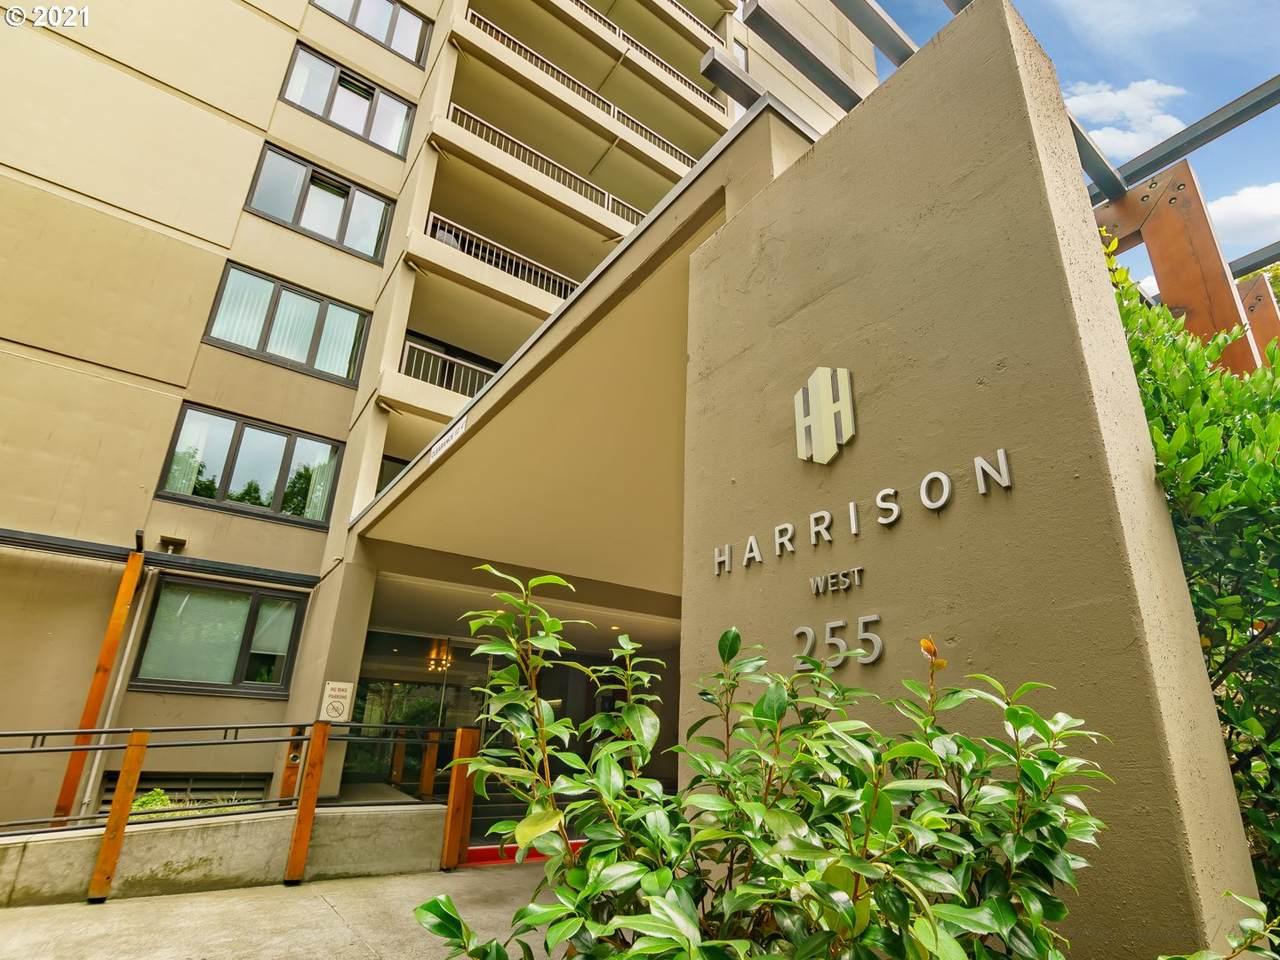 255 Harrison St - Photo 1